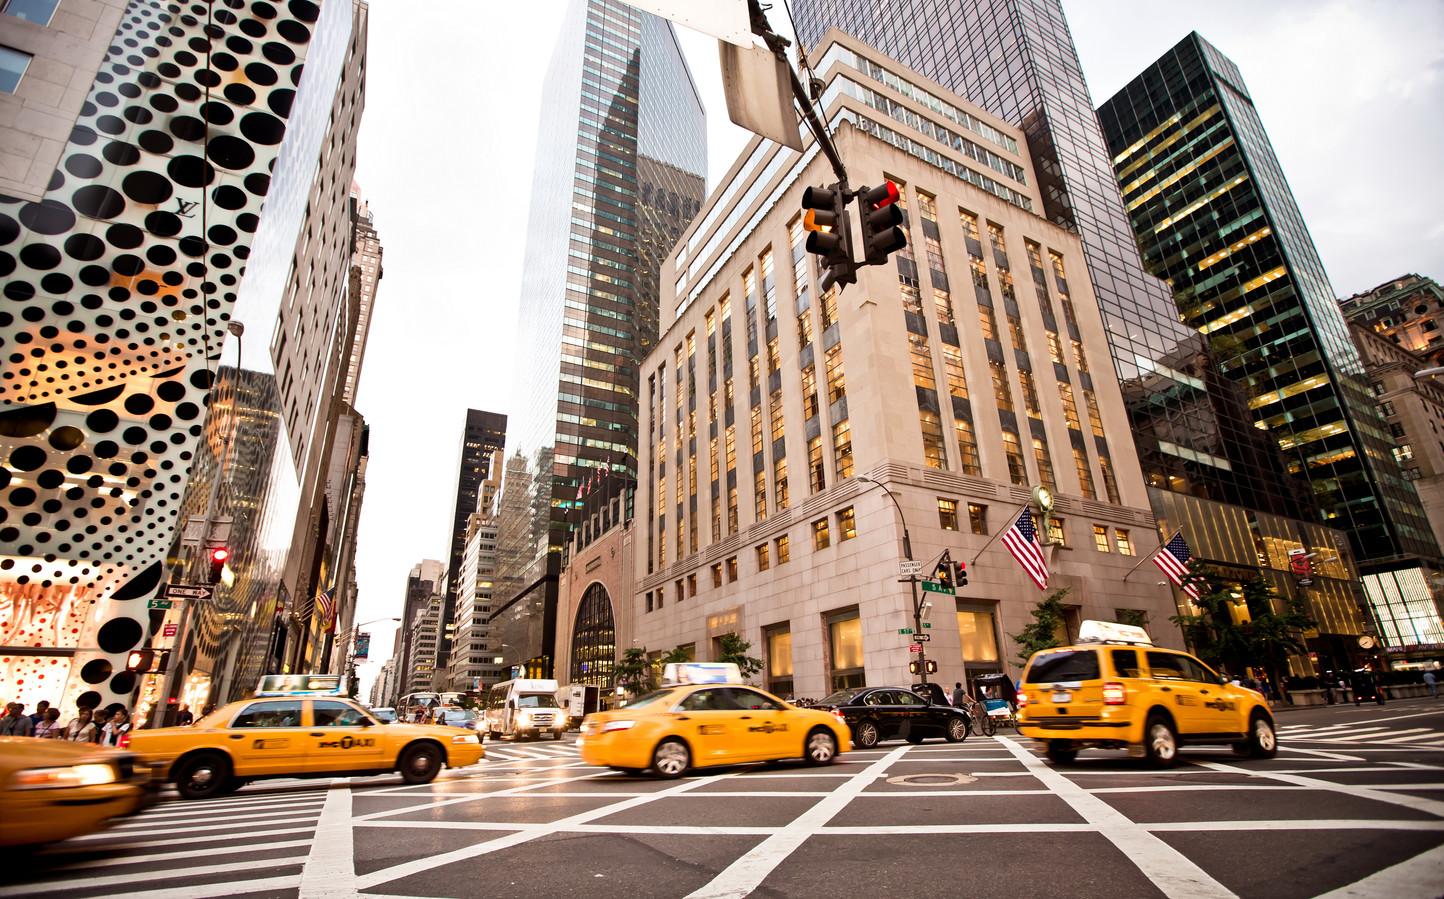 New York, 5th Avenue.